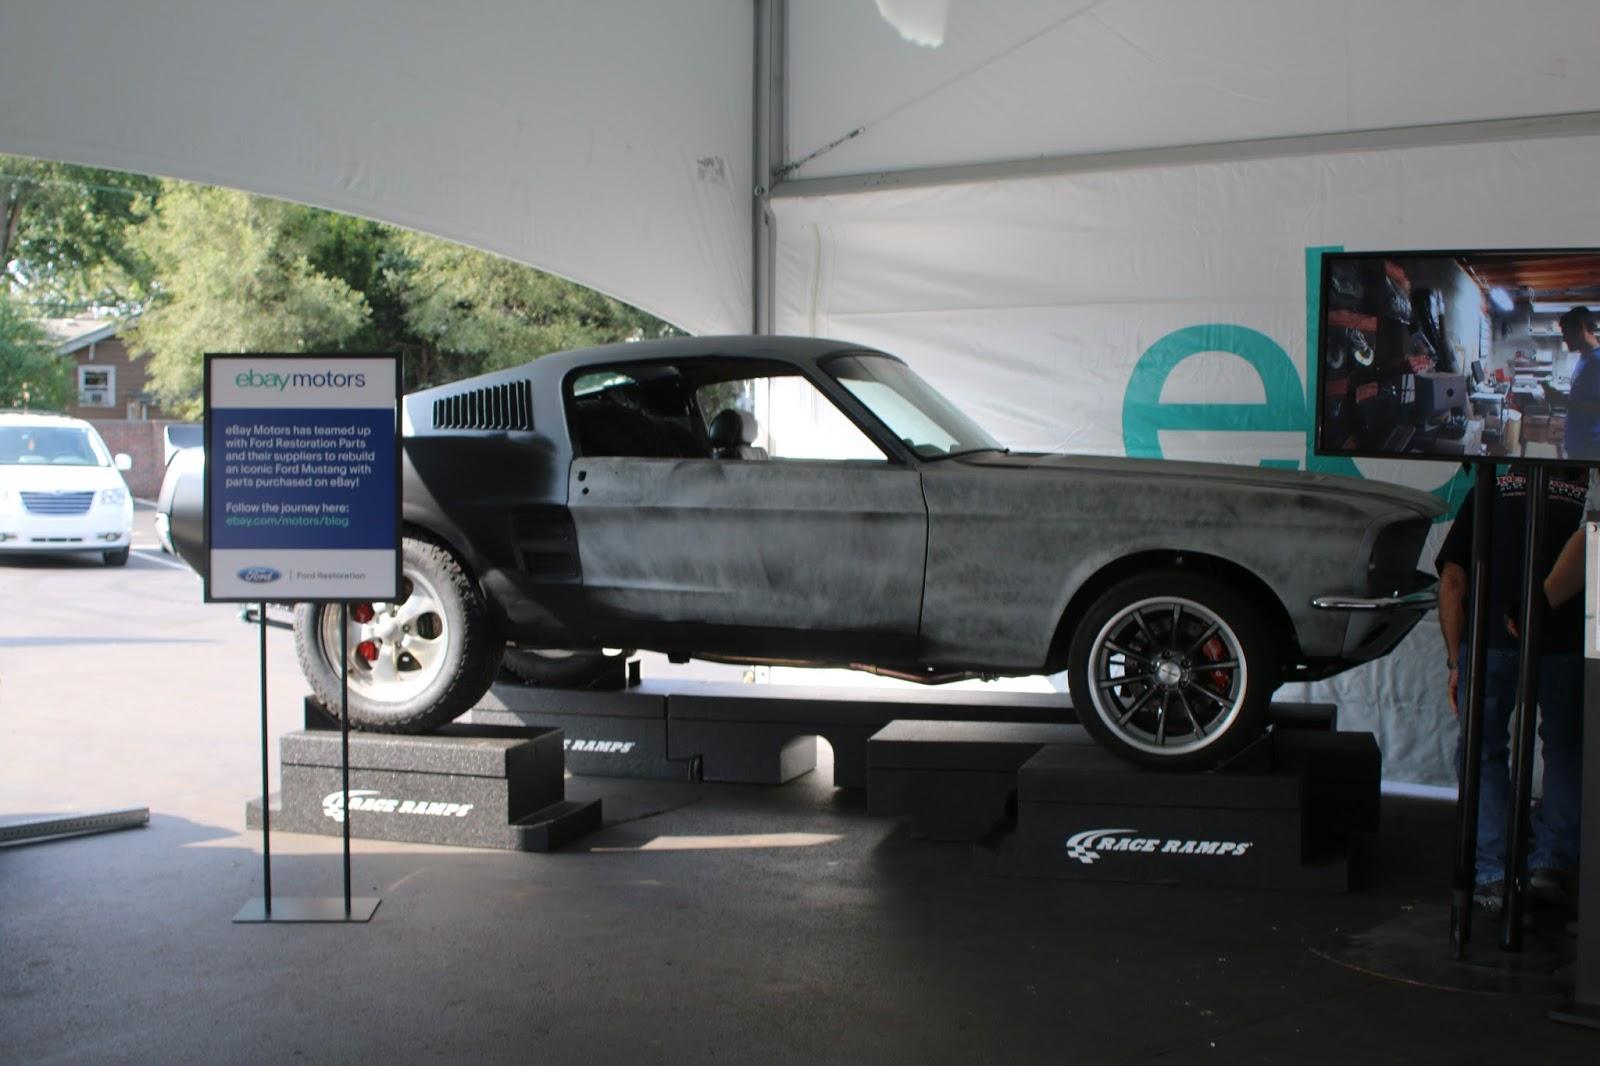 Woodward Dream Cruise With Ebay Motors